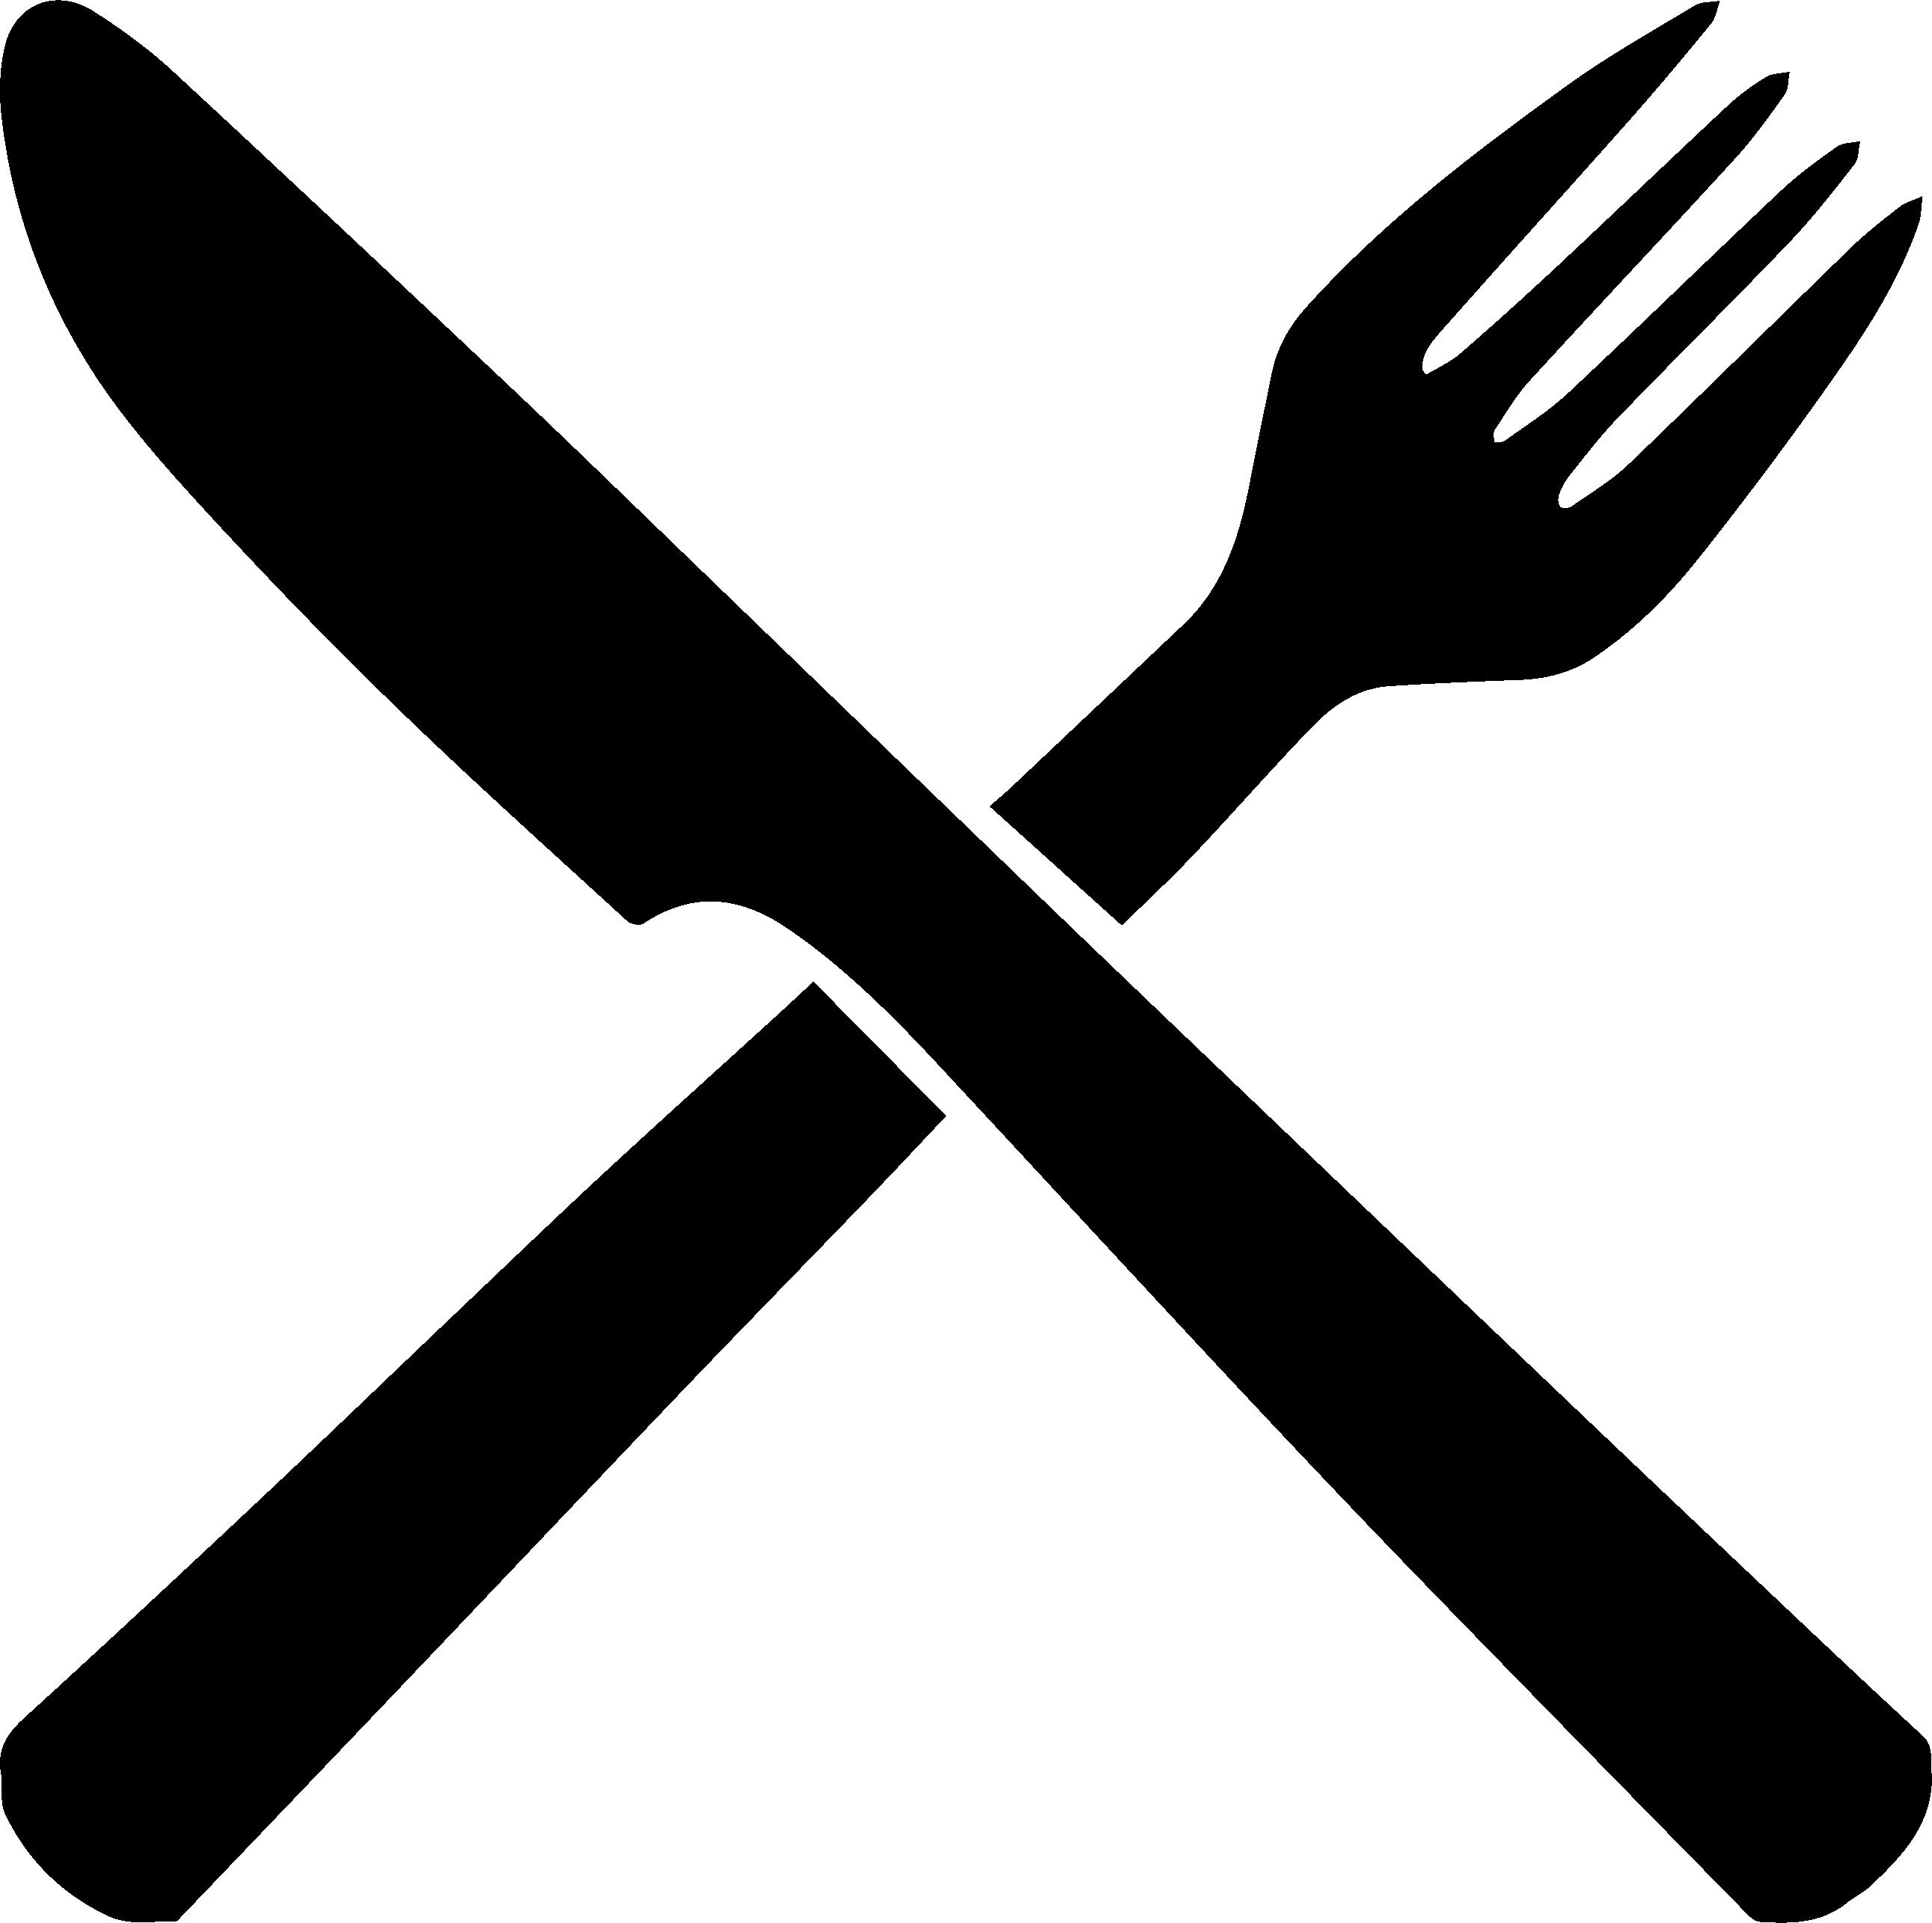 370x275